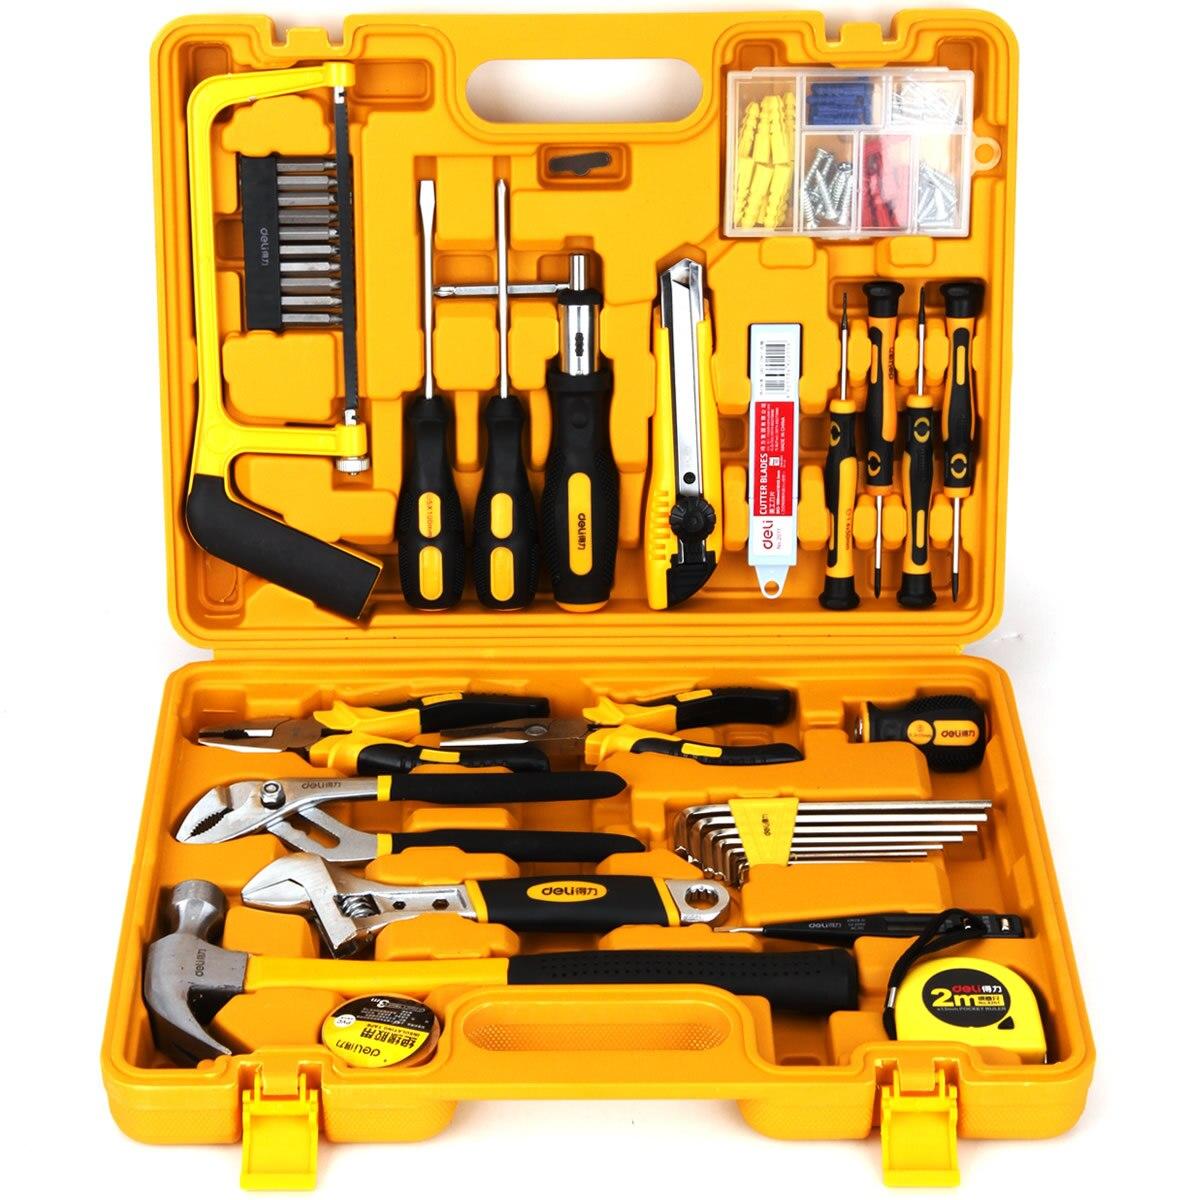 Carpenter Tools Box Multifunction Professional Hardware Repair Tool Box Organizer Maleta De Ferramenta Tools Packaging DA60GJX